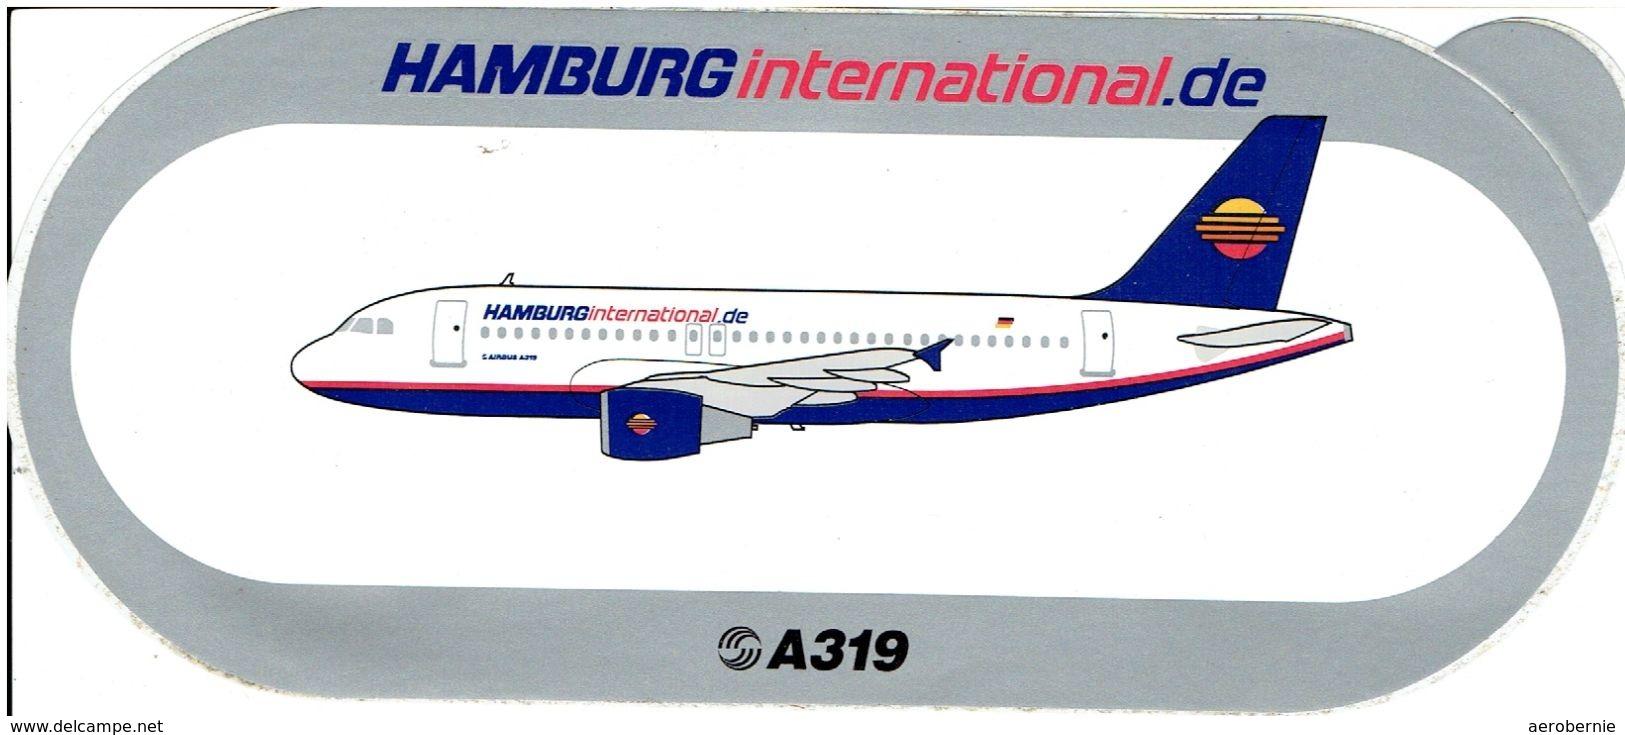 AIRBUS - Sticker: HAMBURG INTERNATONAL - A-319 - Aufkleber